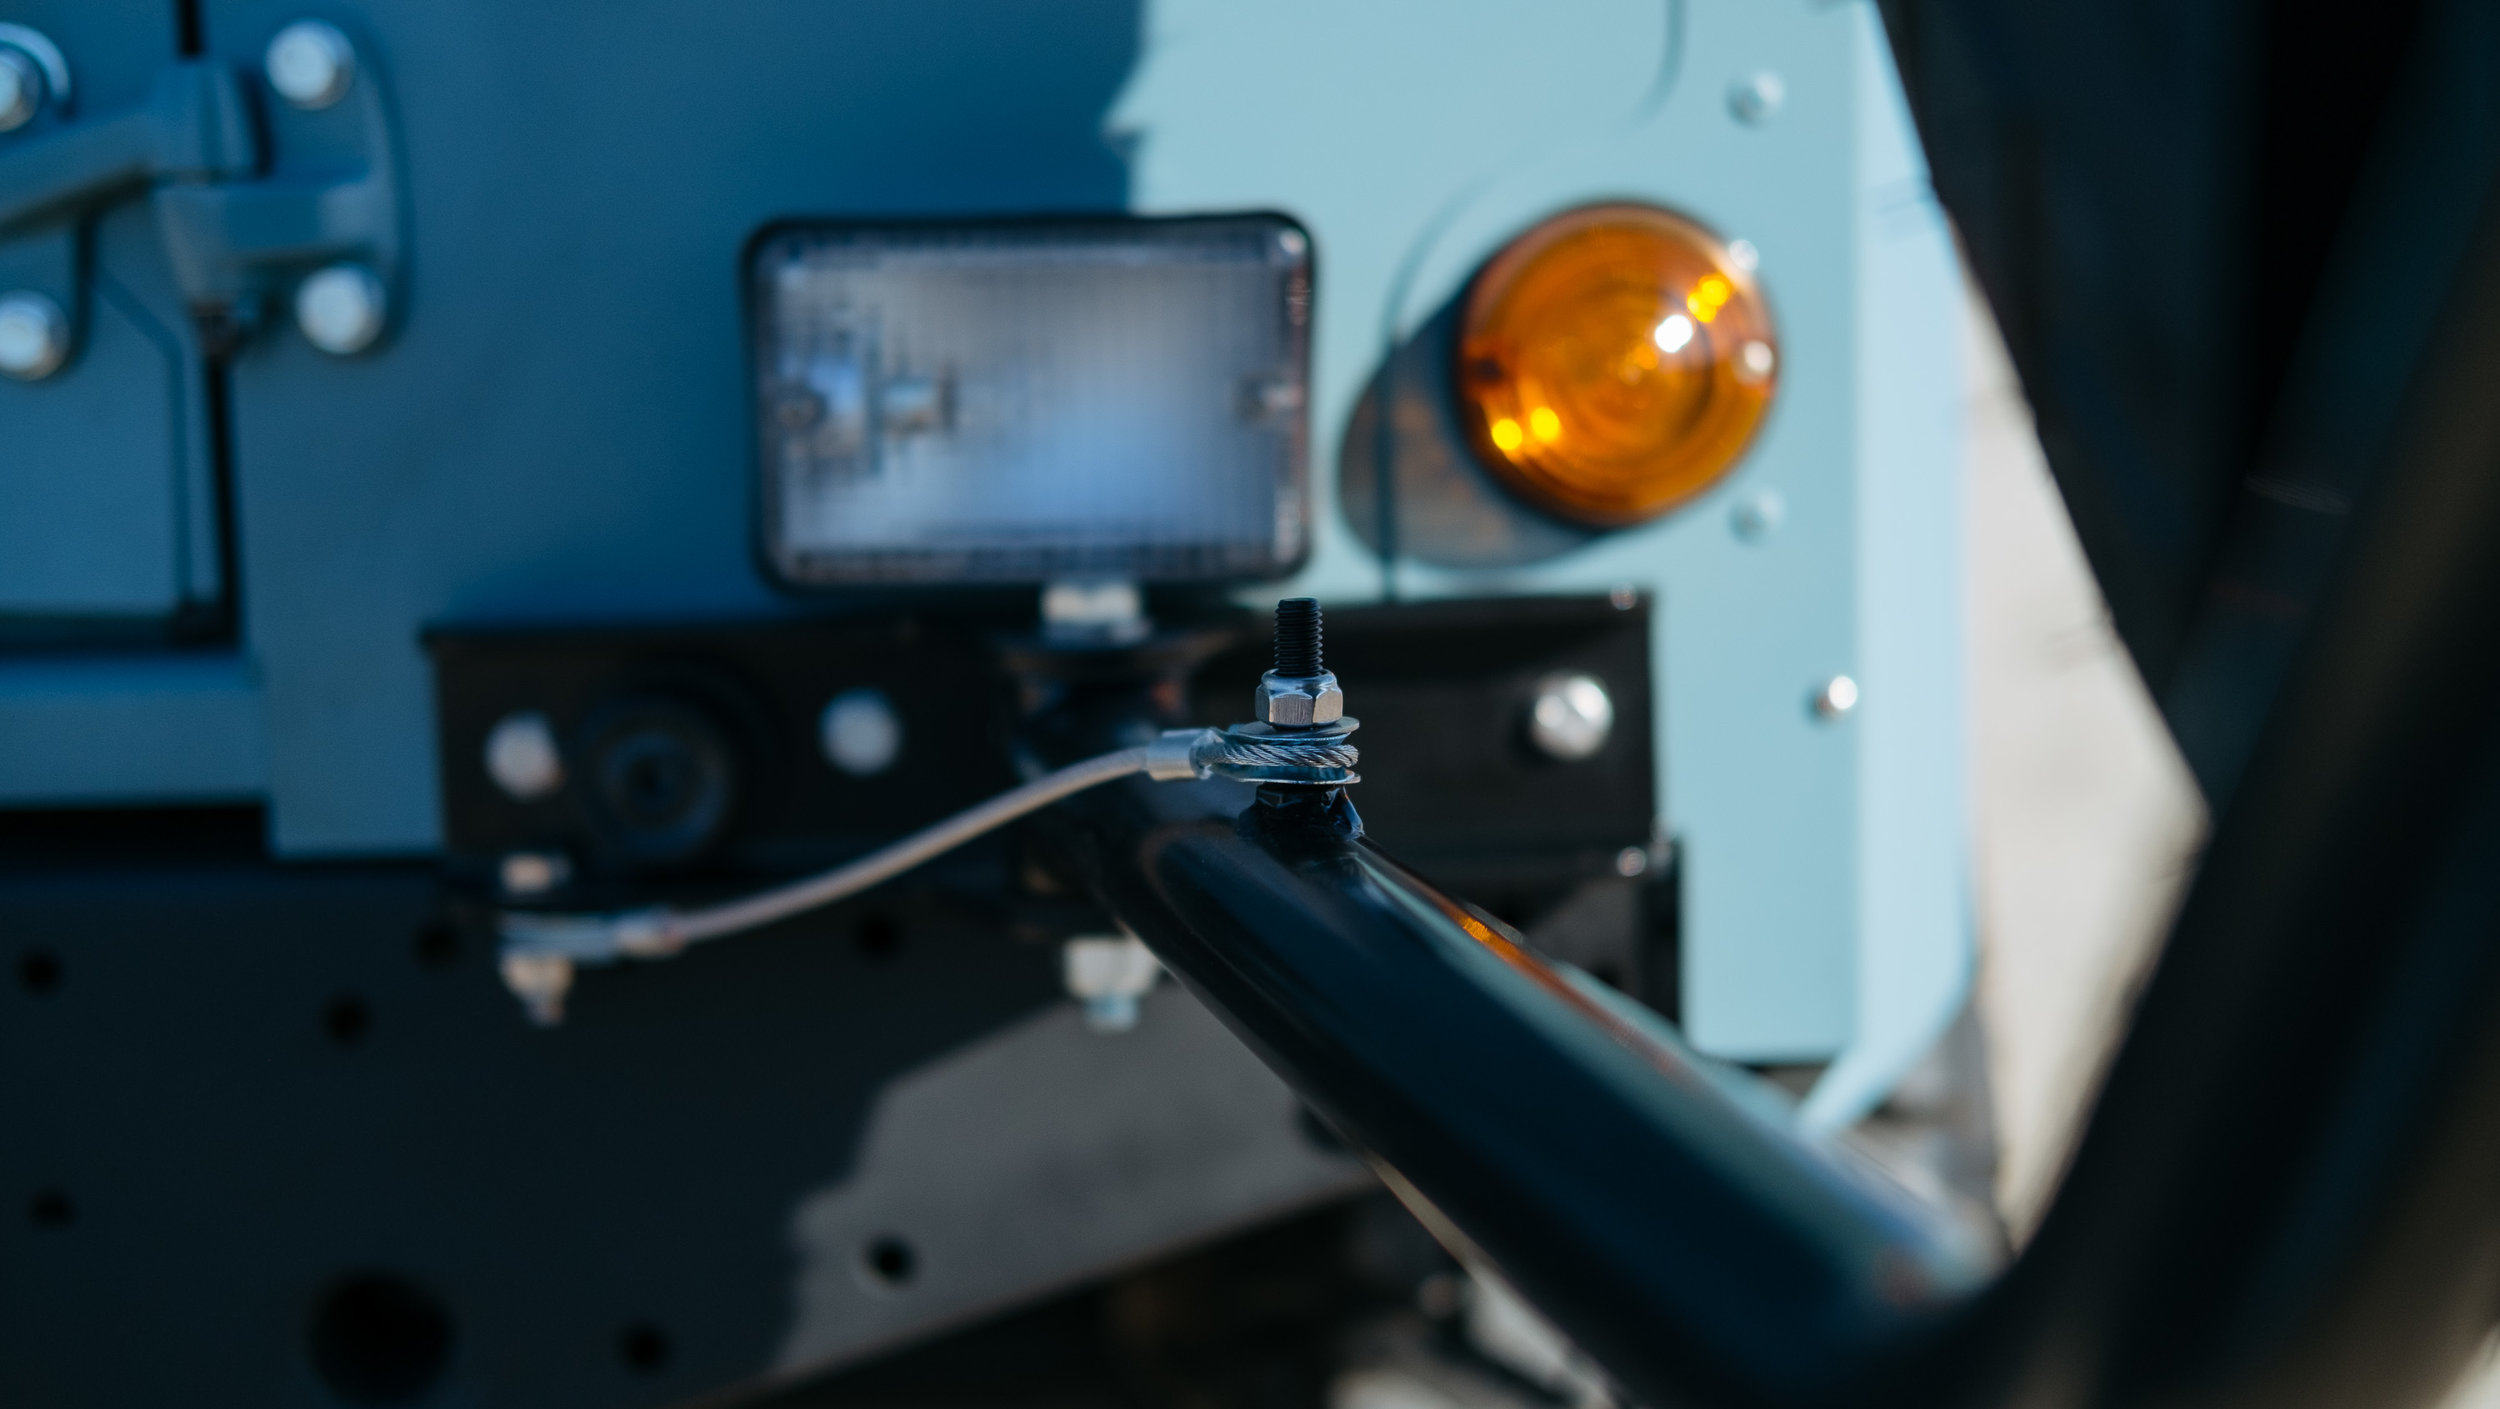 coolnvintage Land Rover Defender (7 of 98).jpg